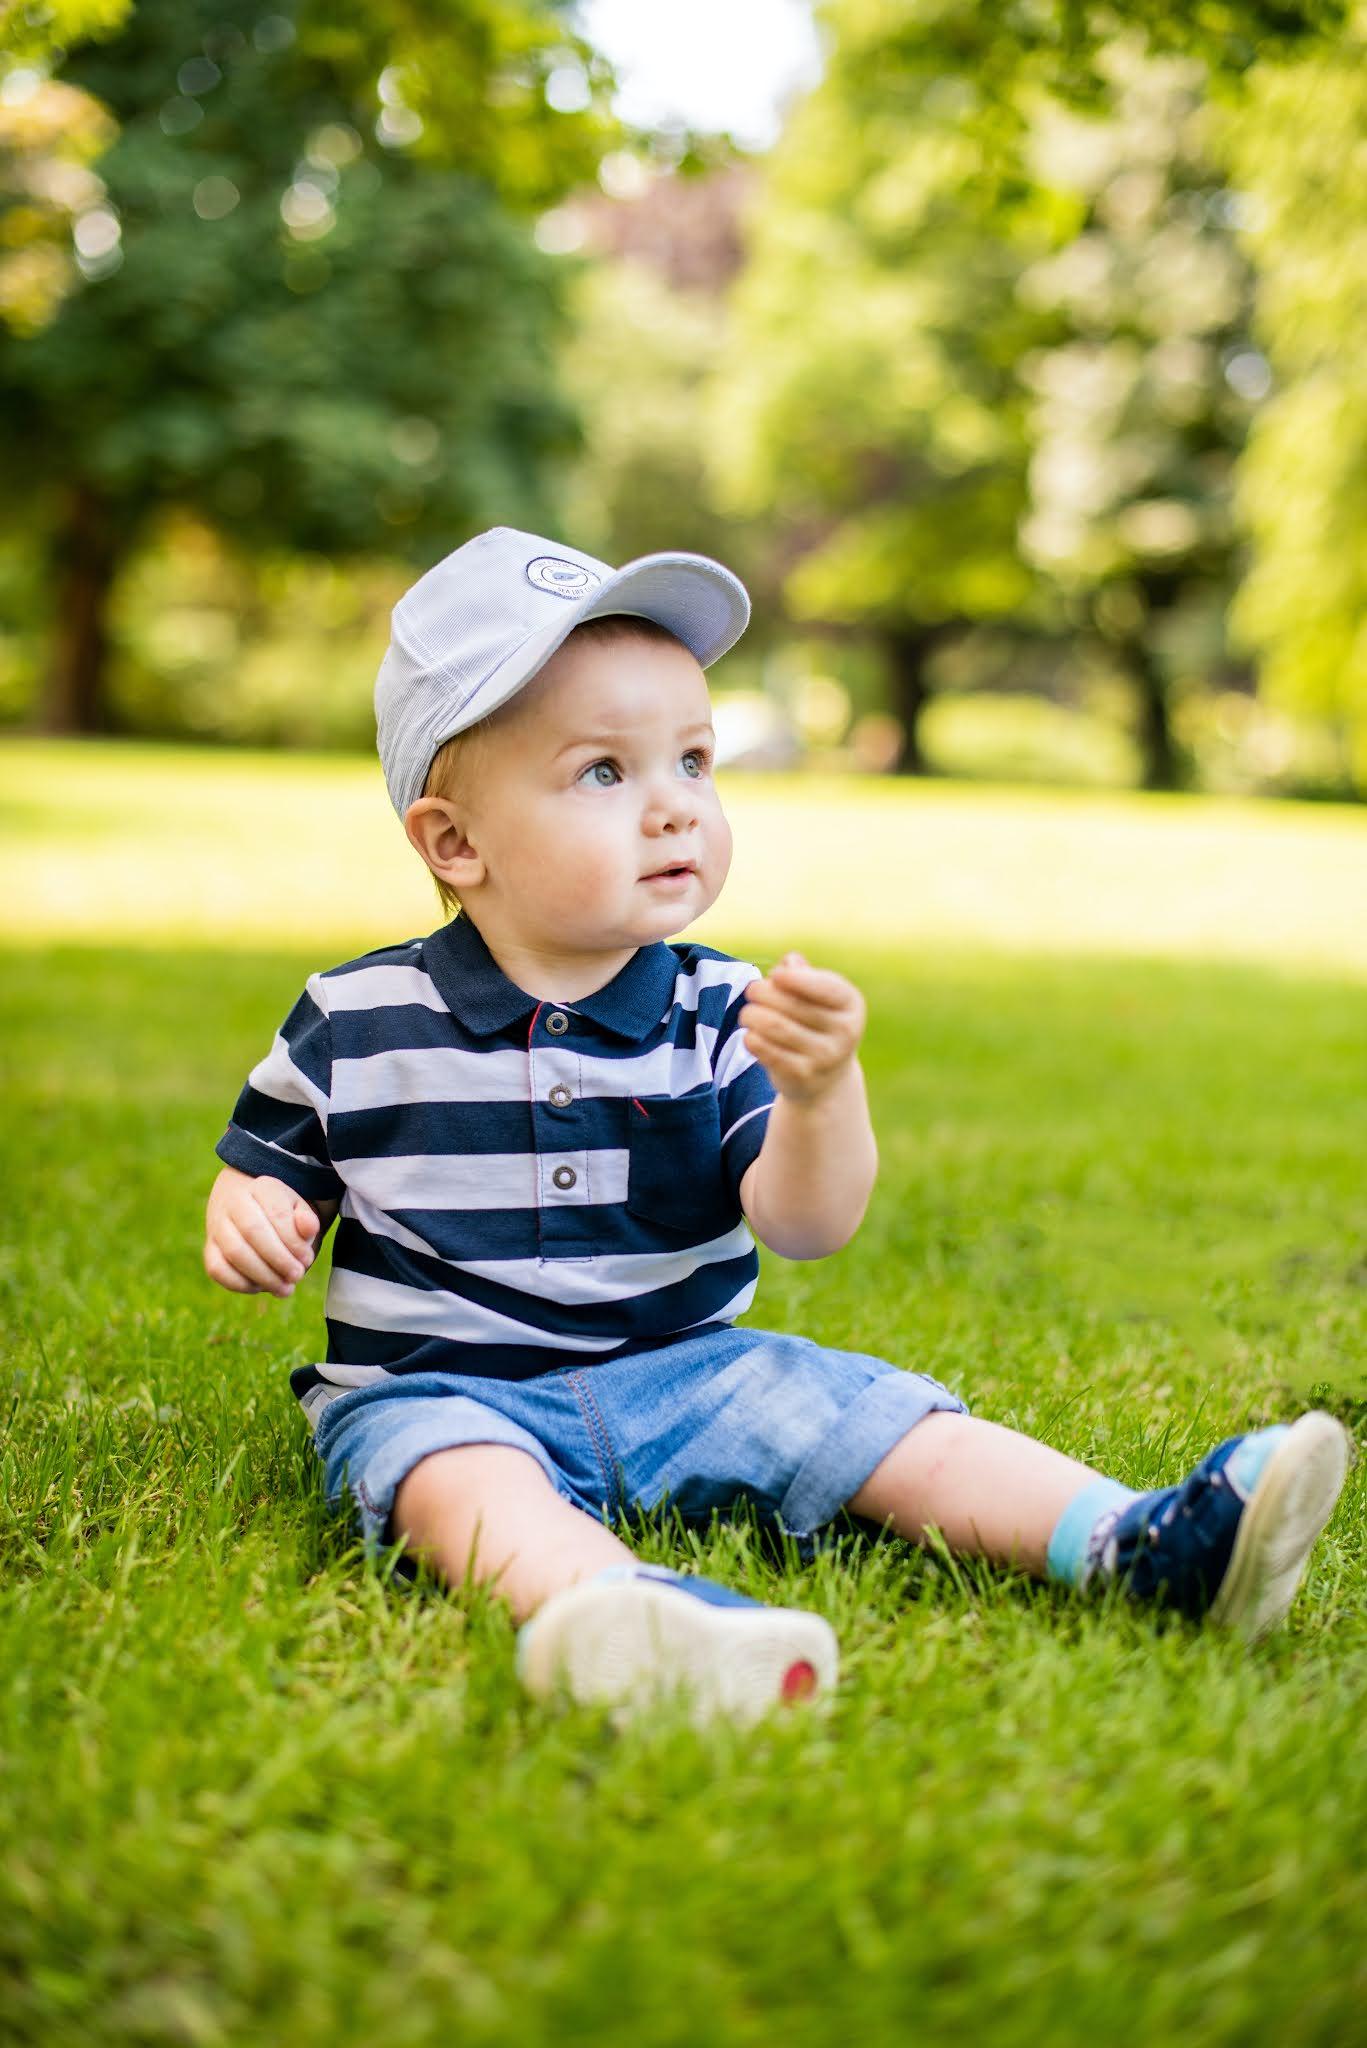 Baby photoshoot outdoor